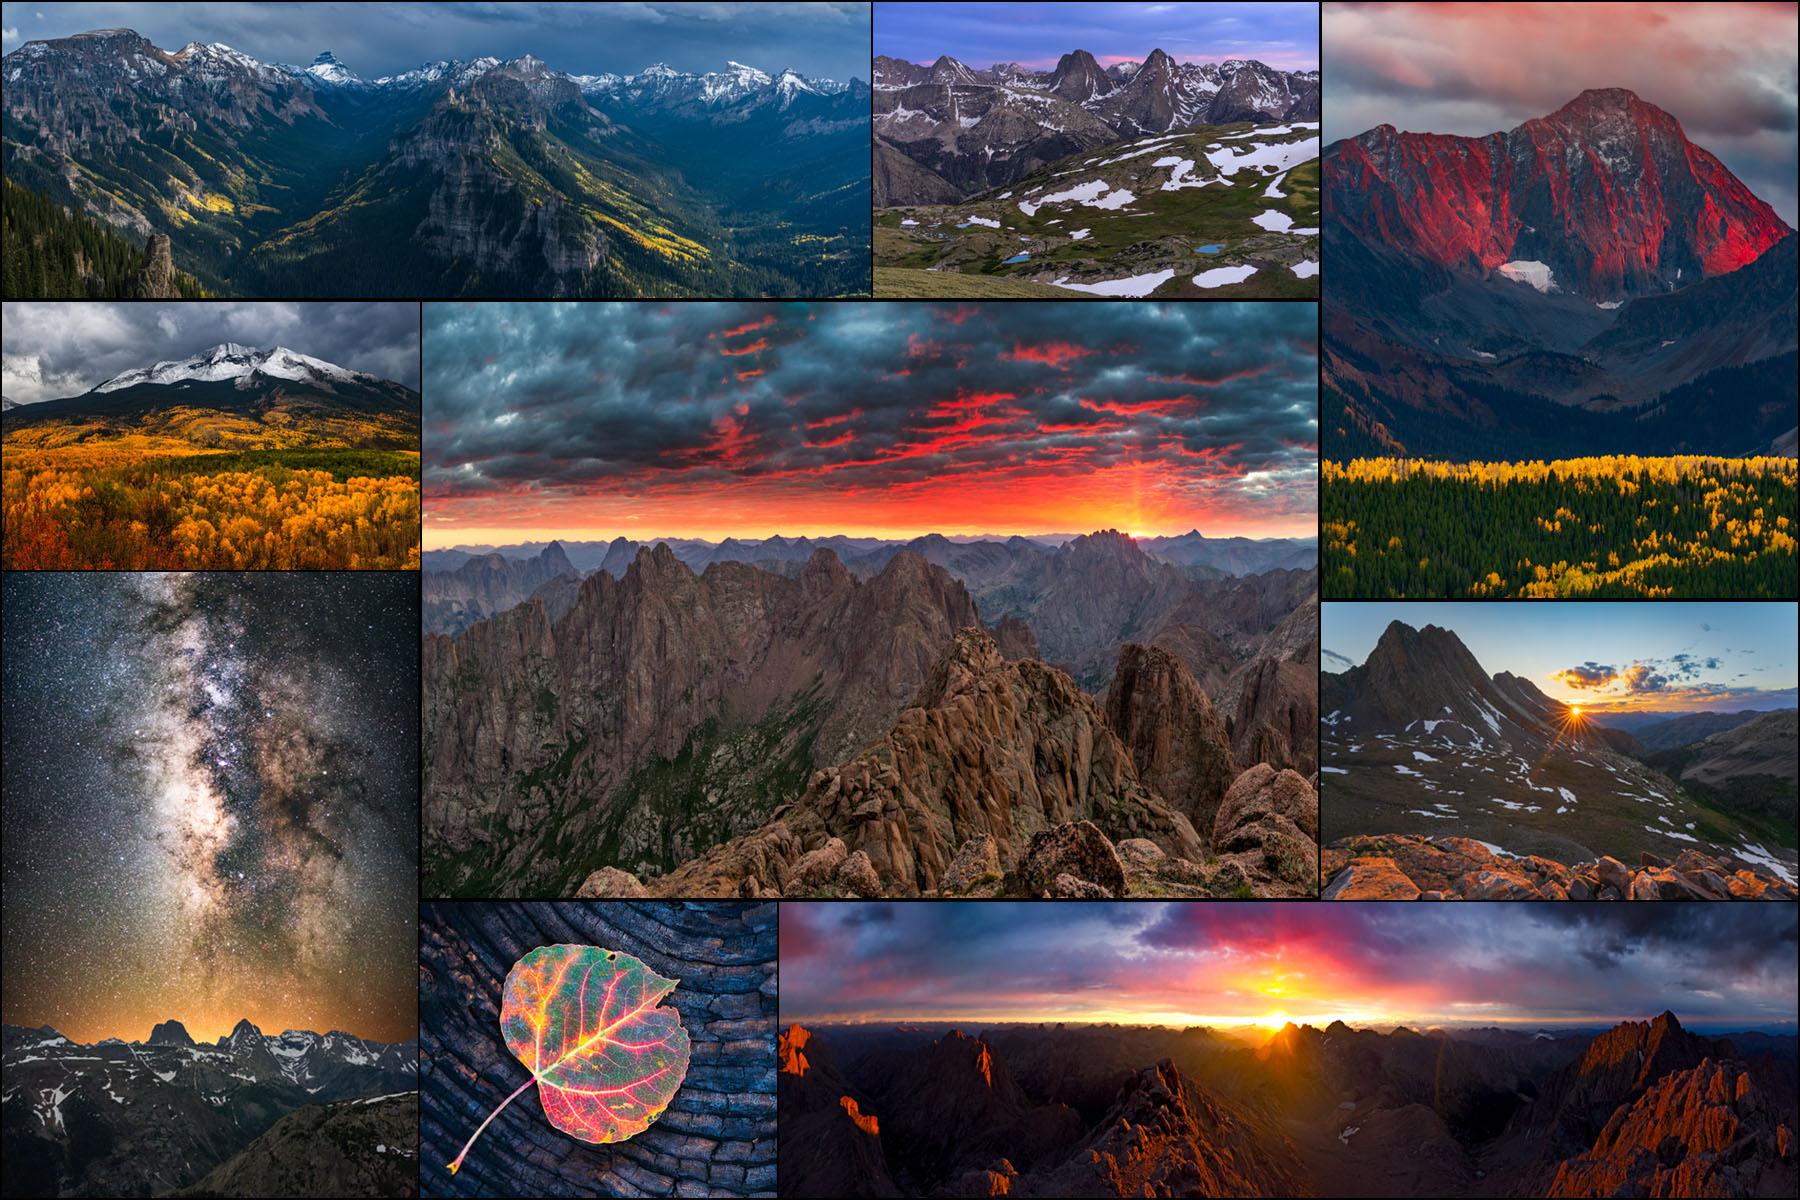 Colorado, Landscape Photography, Fourteeners, 14ers, Matt Payne, Prints, Photography, Nature